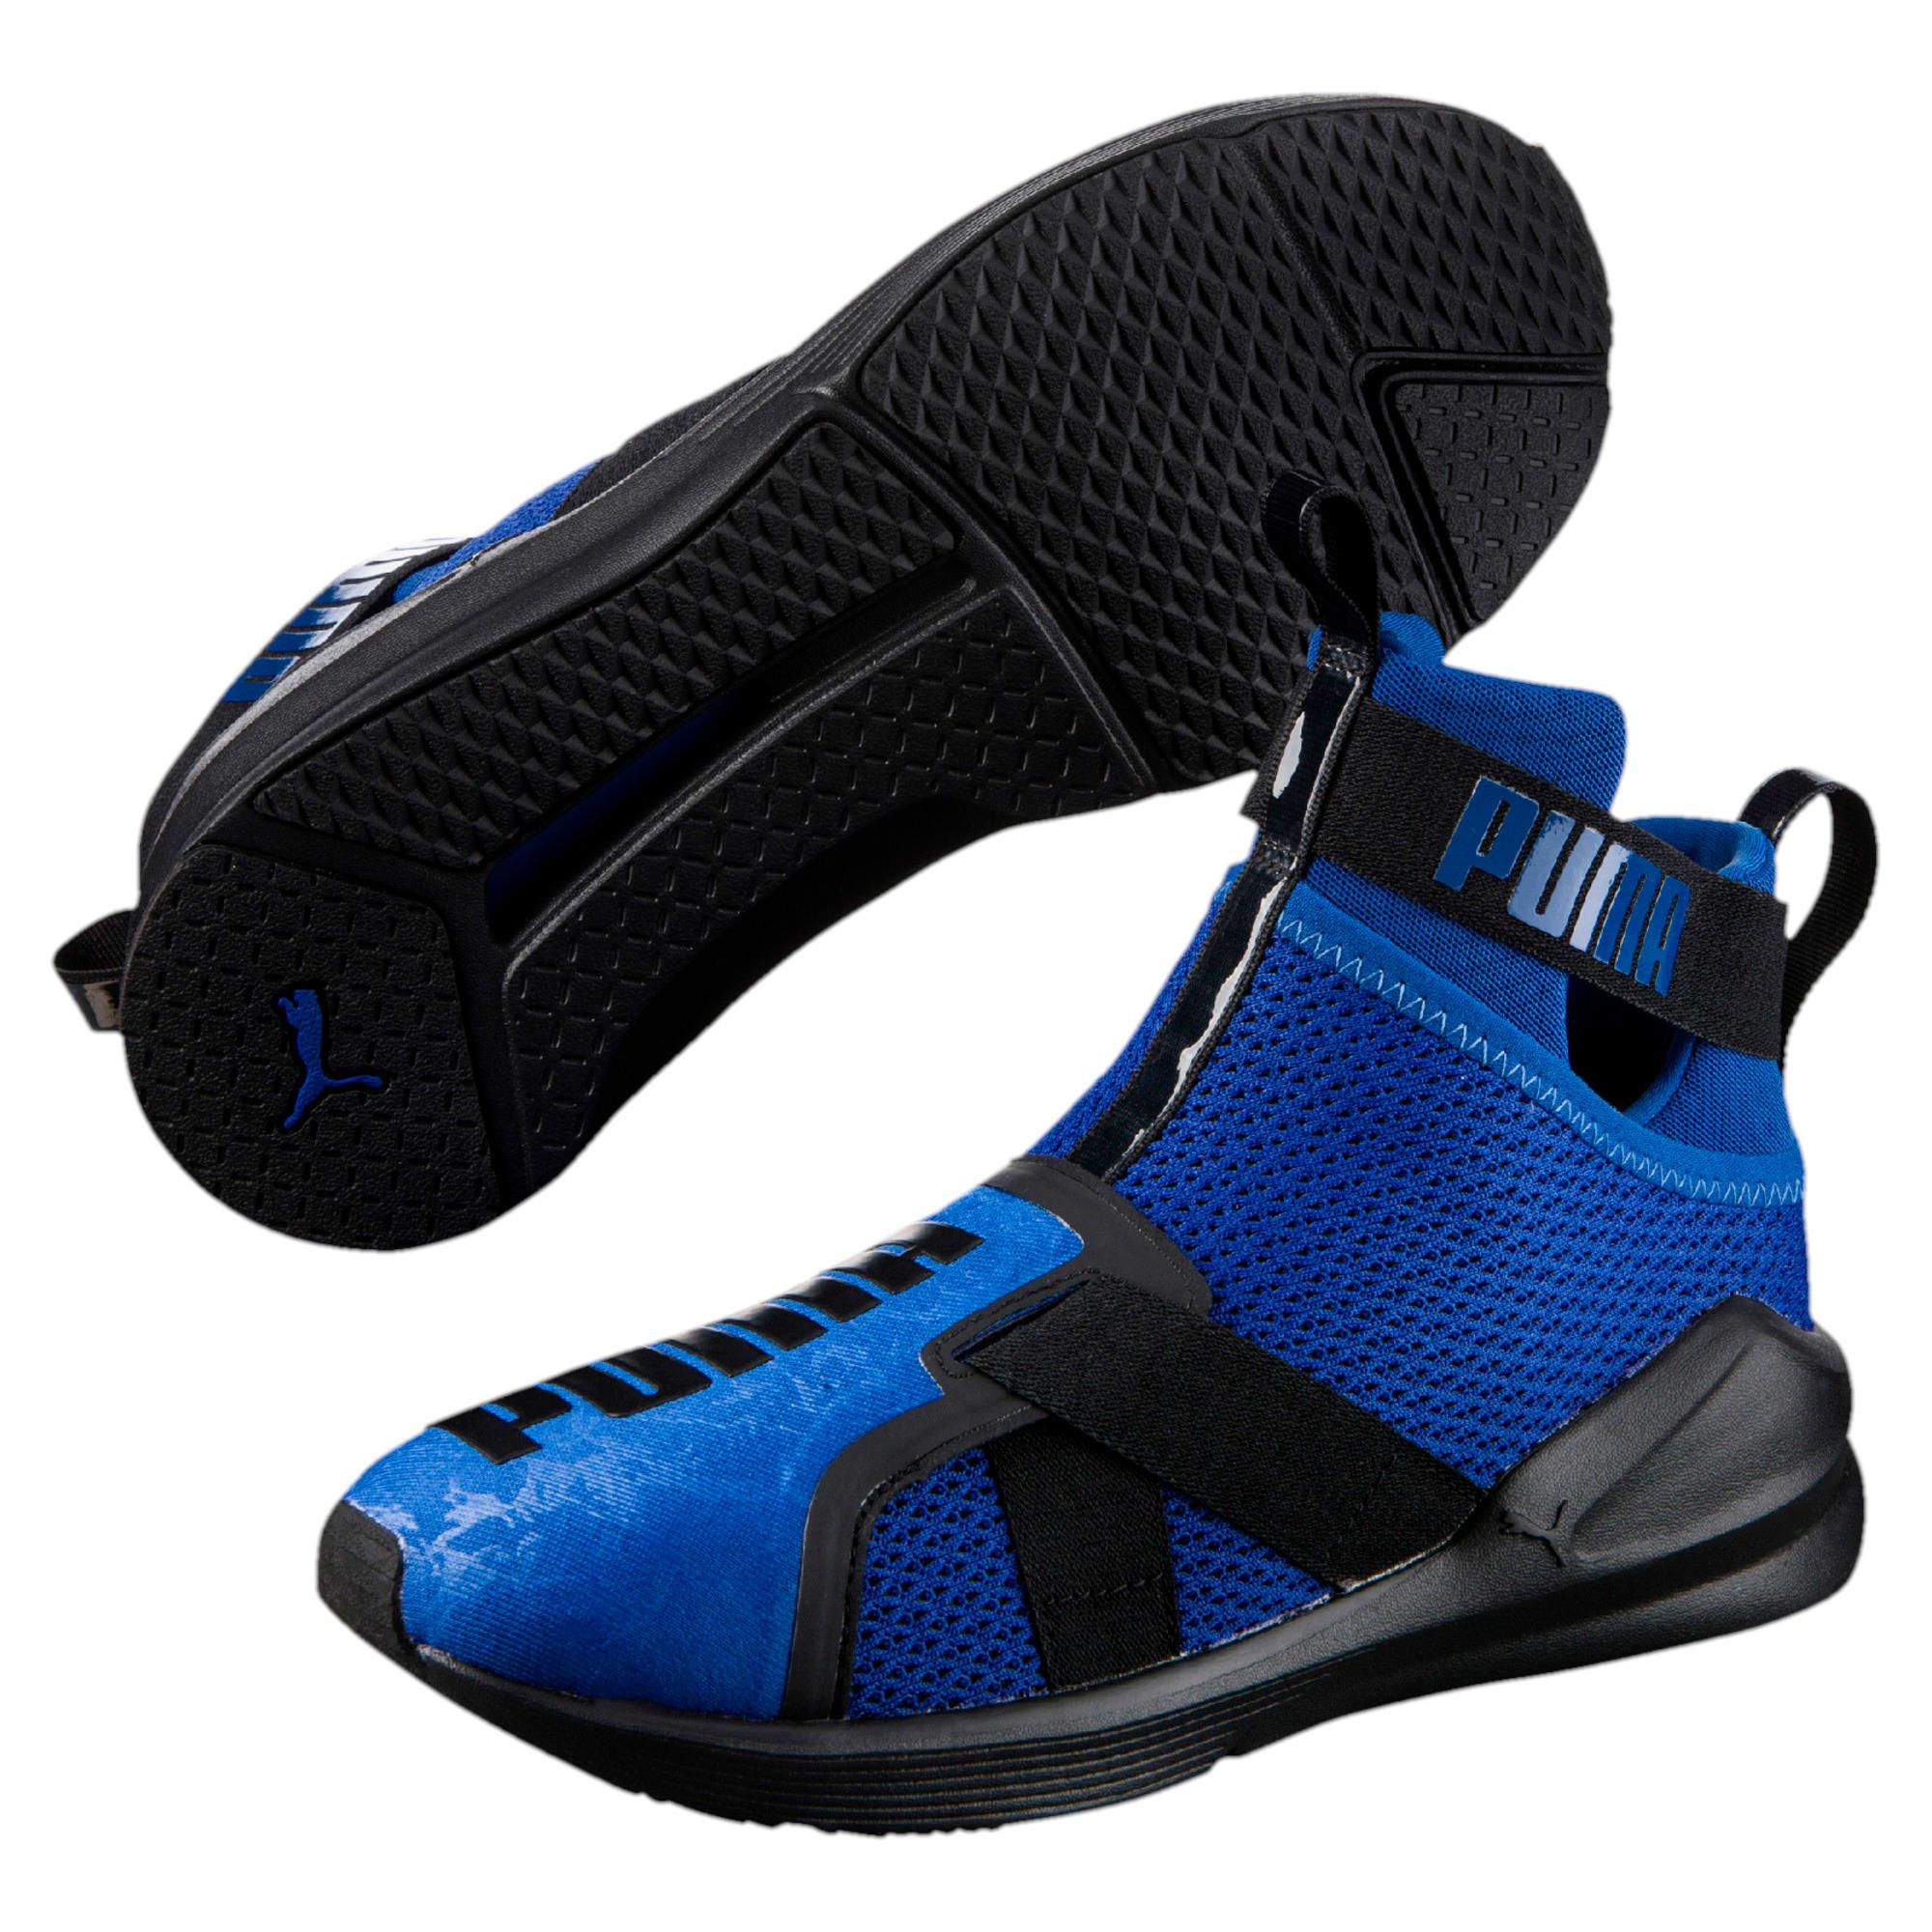 Thumbnail 6 of PUMA Fierce Strap Training Shoes, TRUE BLUE-Puma Black, medium-IND